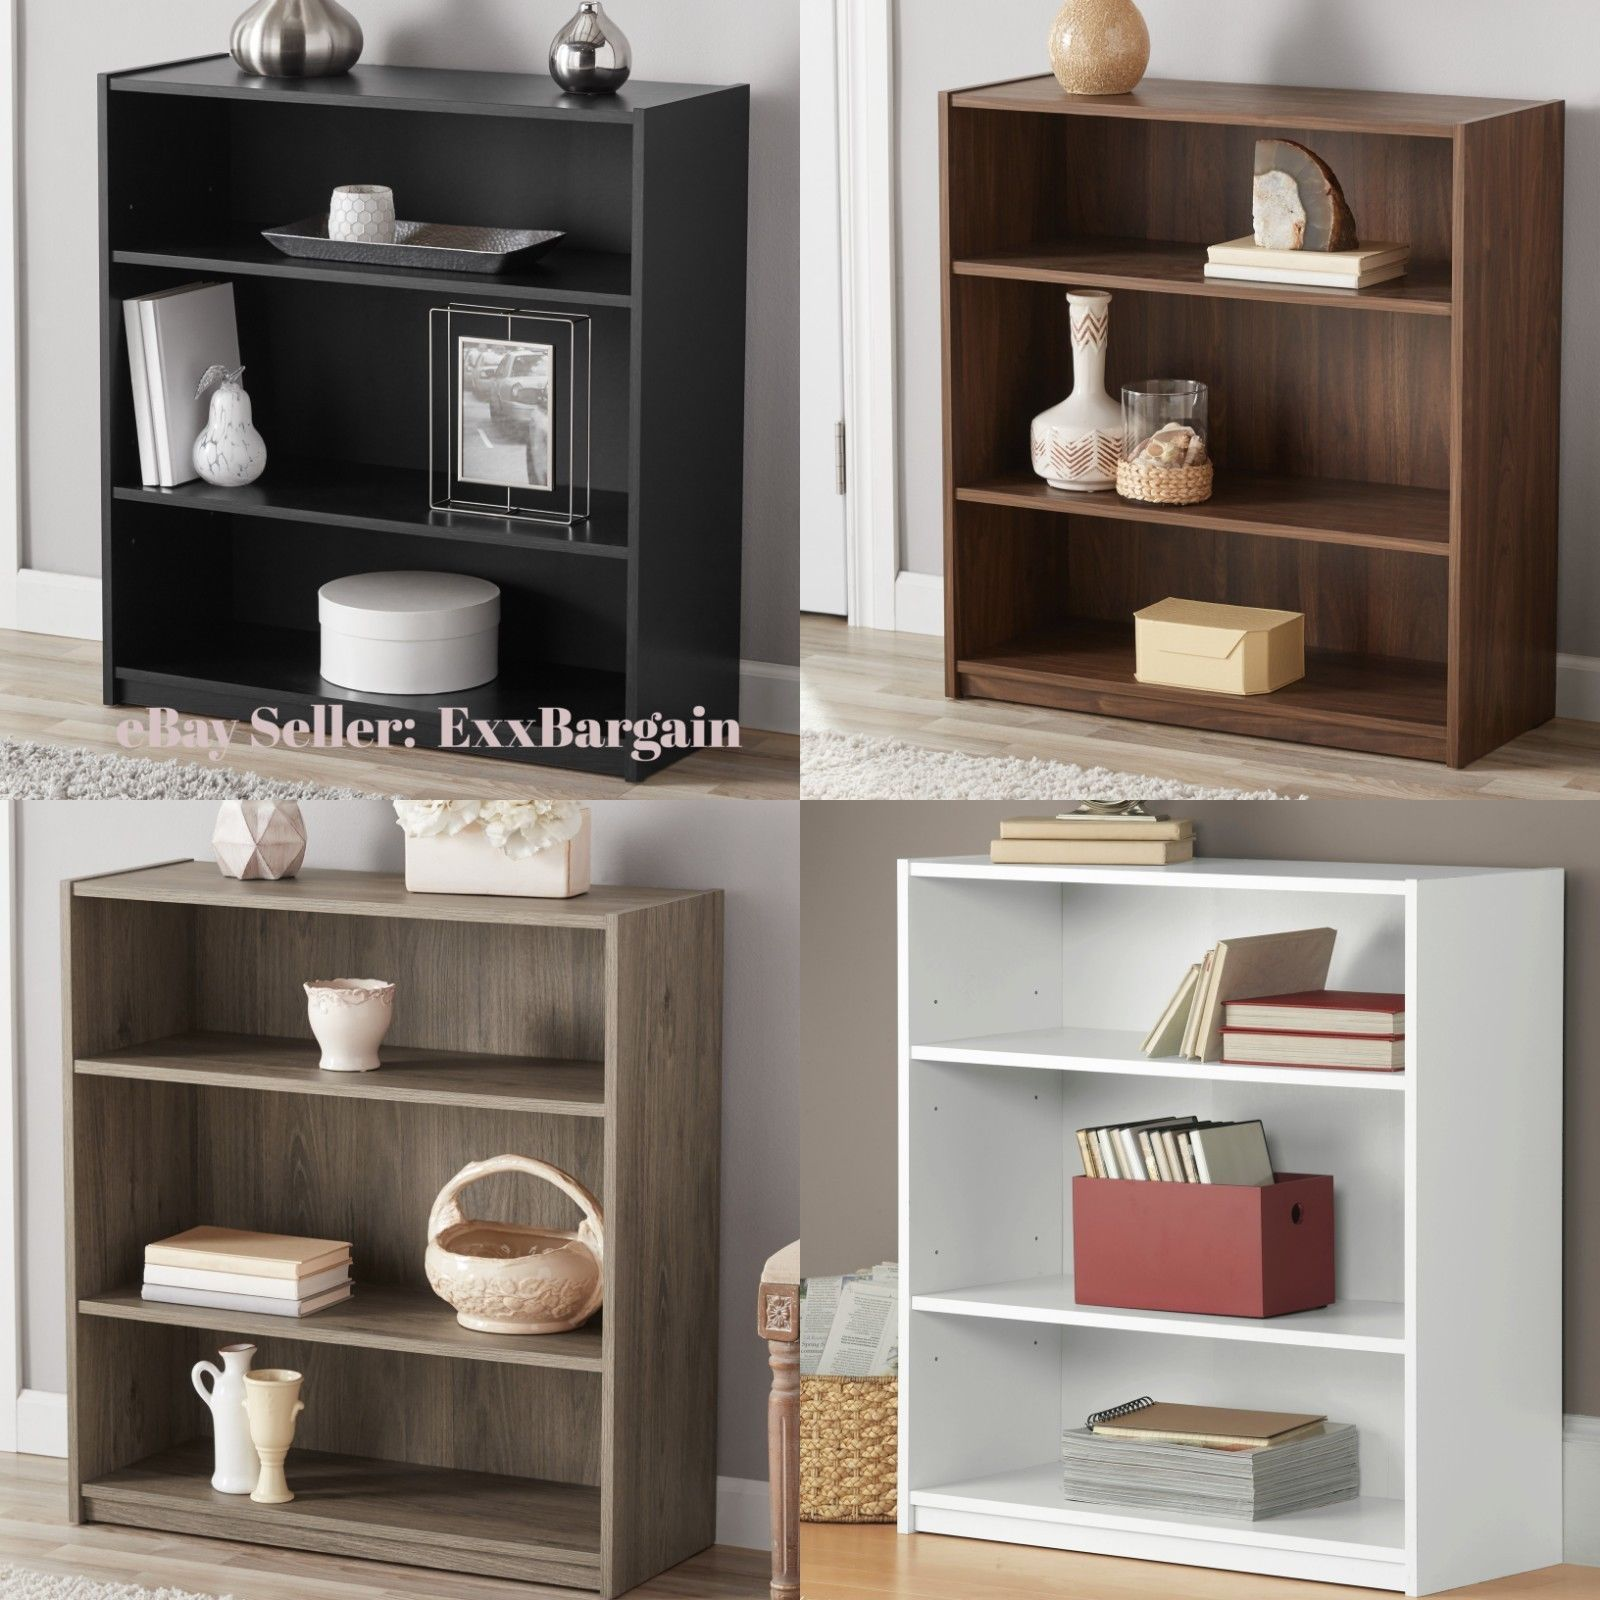 Details About Adjustable 3 Shelf Wood Bookcase Storage Book Display Wide Bookshelf Shelving In 2020 Bookcase